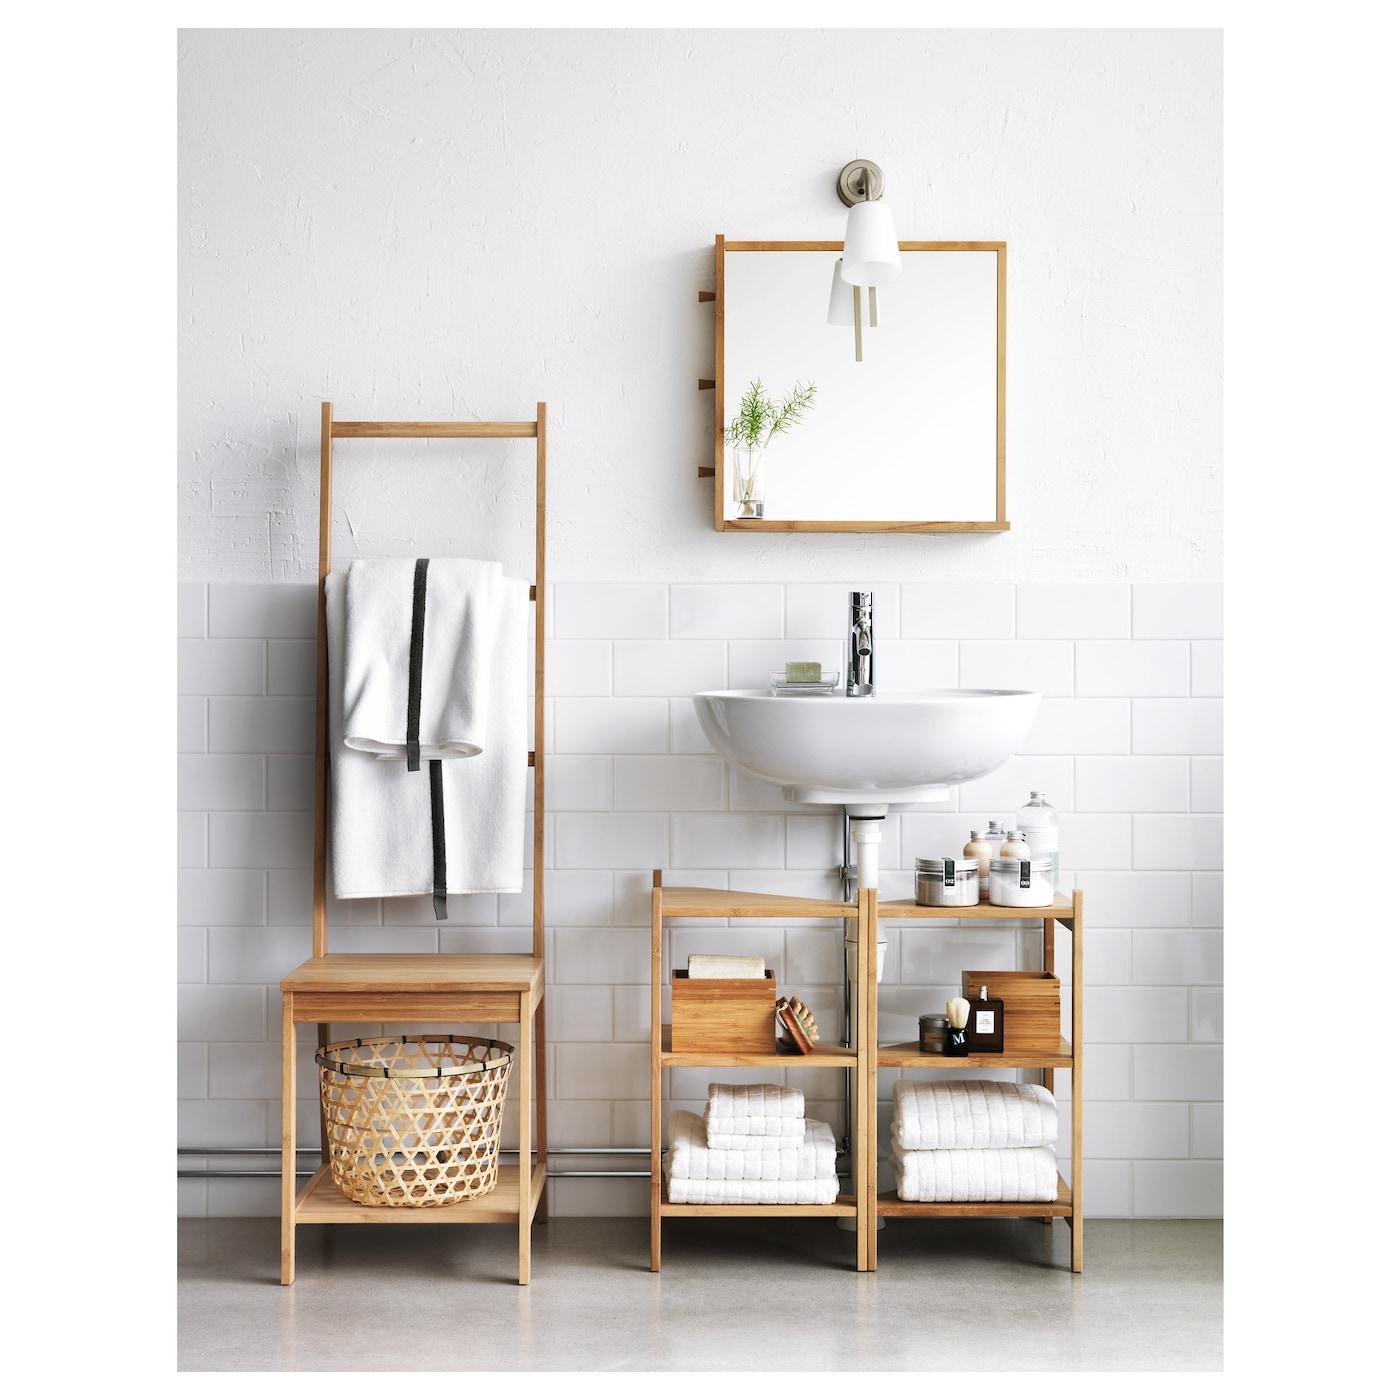 r grund chaise porte serviettes bambou ikea. Black Bedroom Furniture Sets. Home Design Ideas